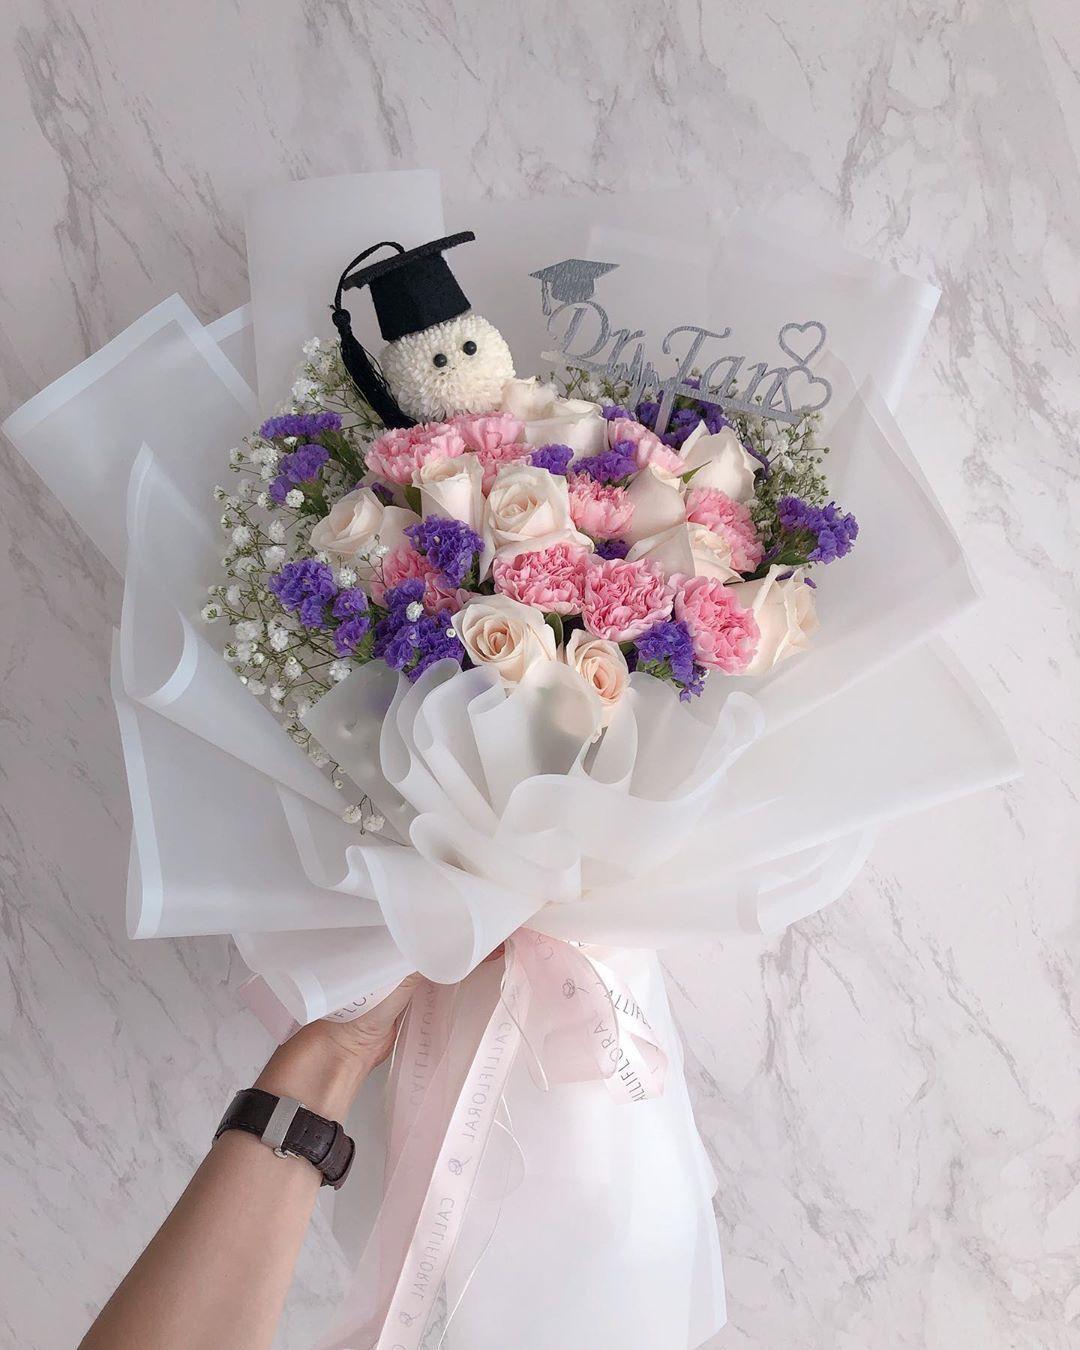 Graduation Bouquet With Personalised Topper Buket Kartu Bunga Rangkaian Bunga